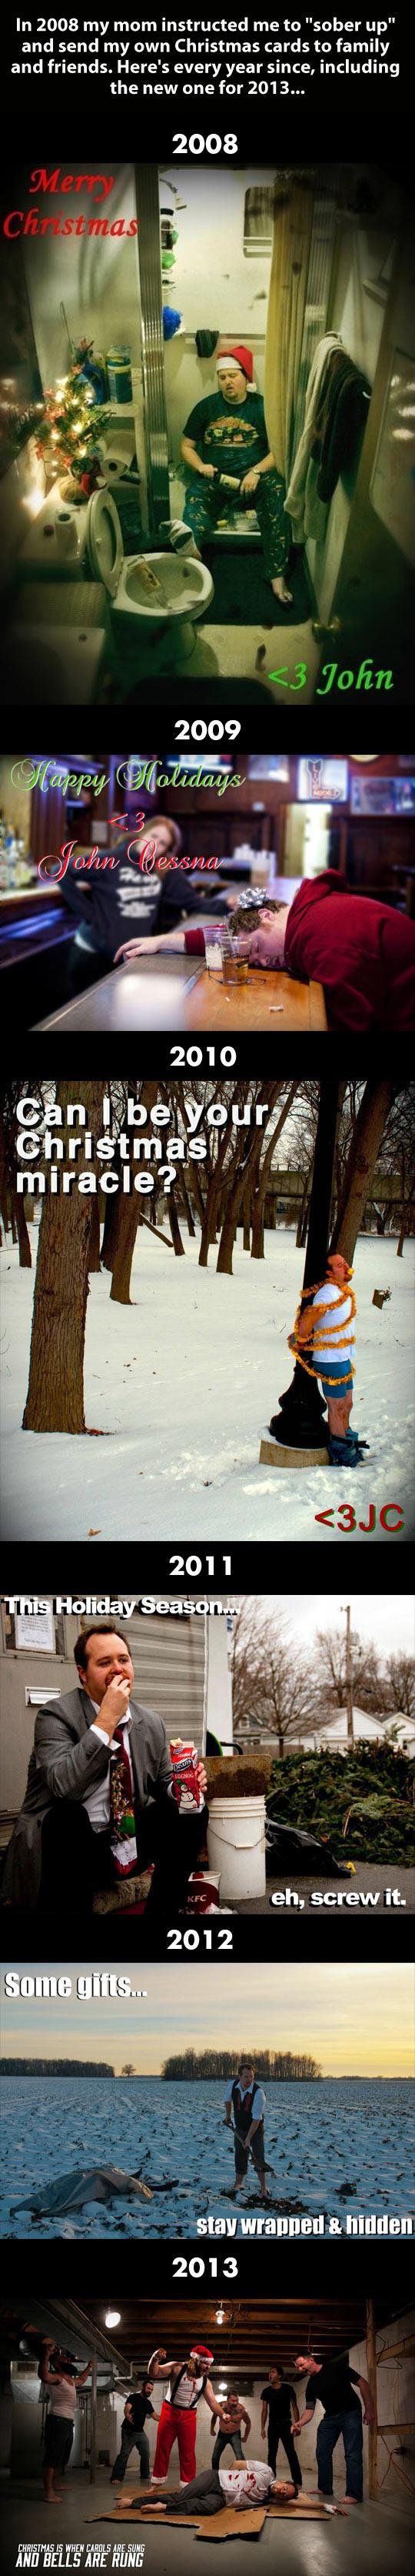 funny-Christmas-card-years-drunk-bathroom